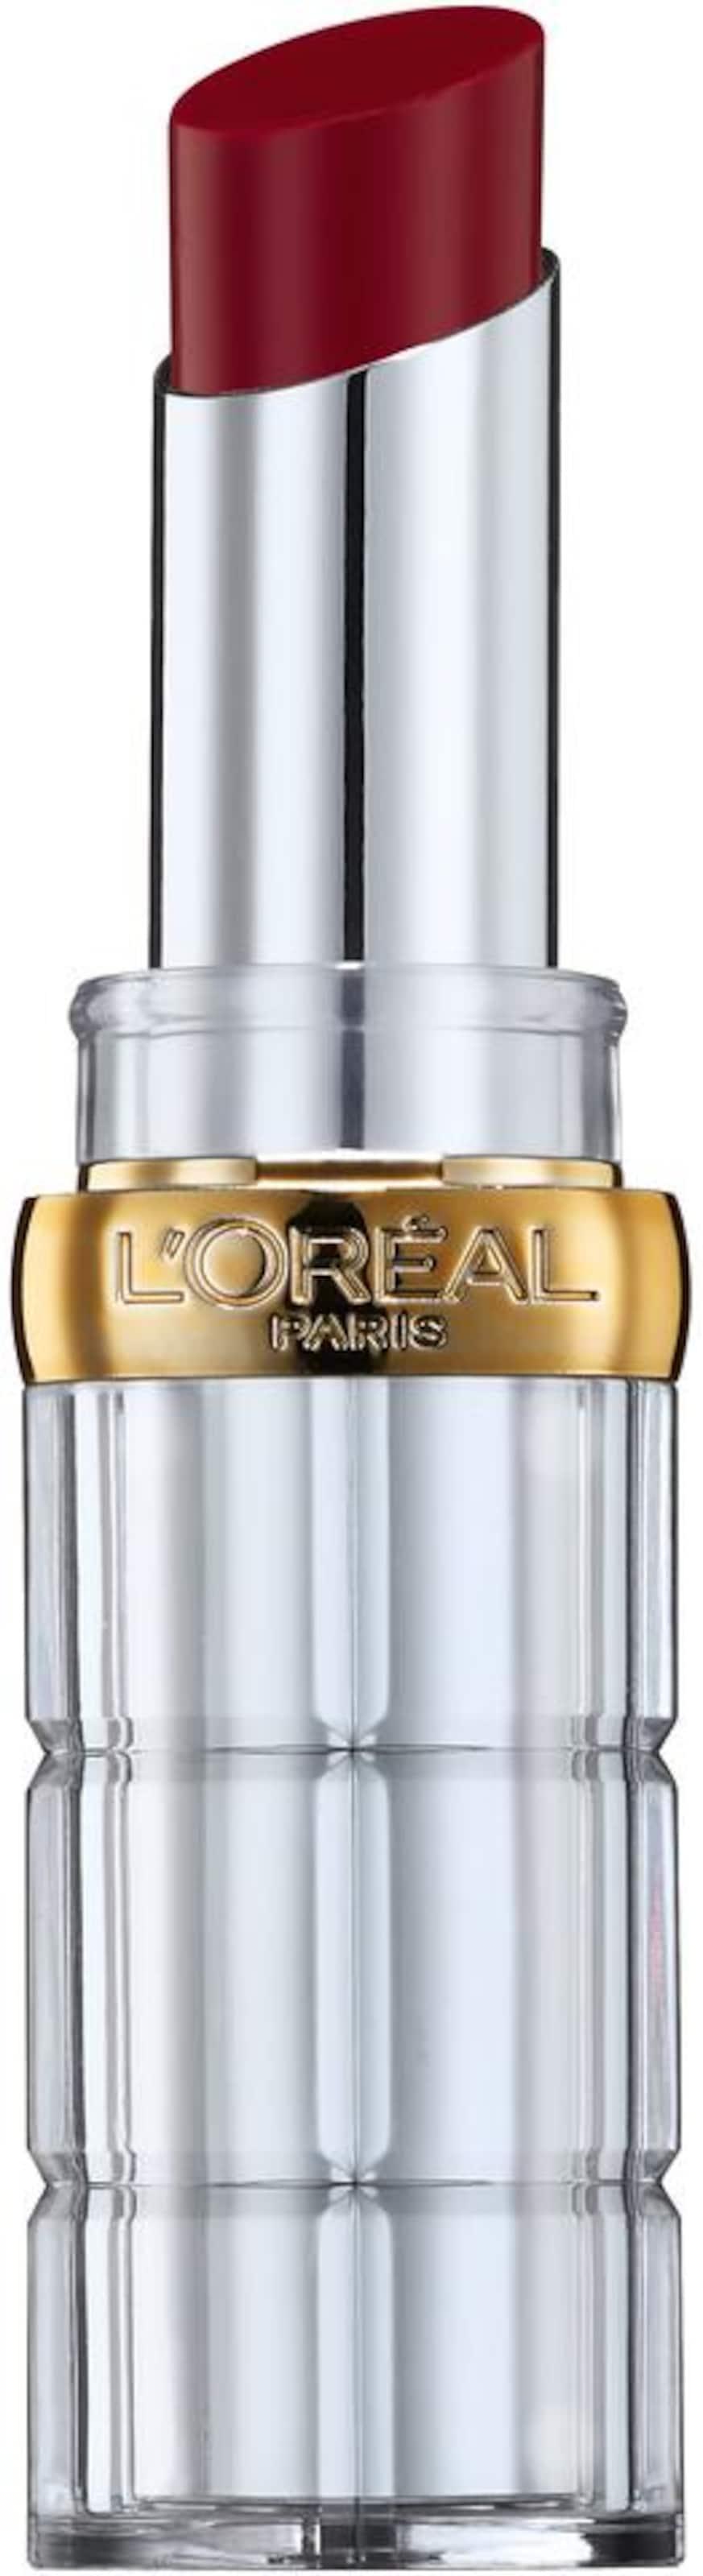 Rubinrot Paris Cr L'oréal 906 In Shine f7bgy6Y